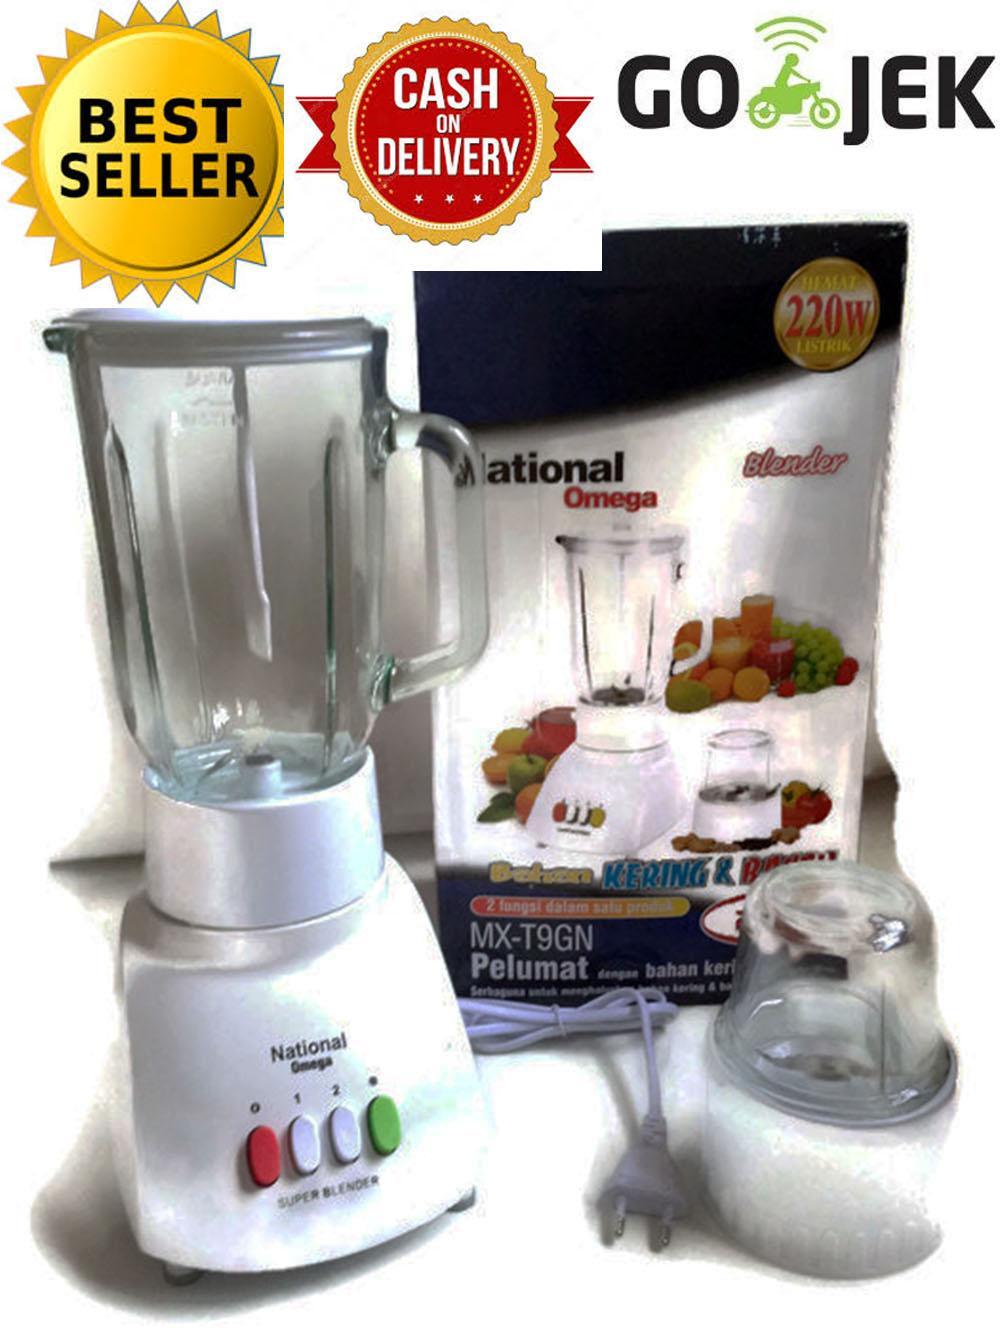 Juicer Pengekstrak Buah Signora Power National Omega Blender 2 In 1 Putih